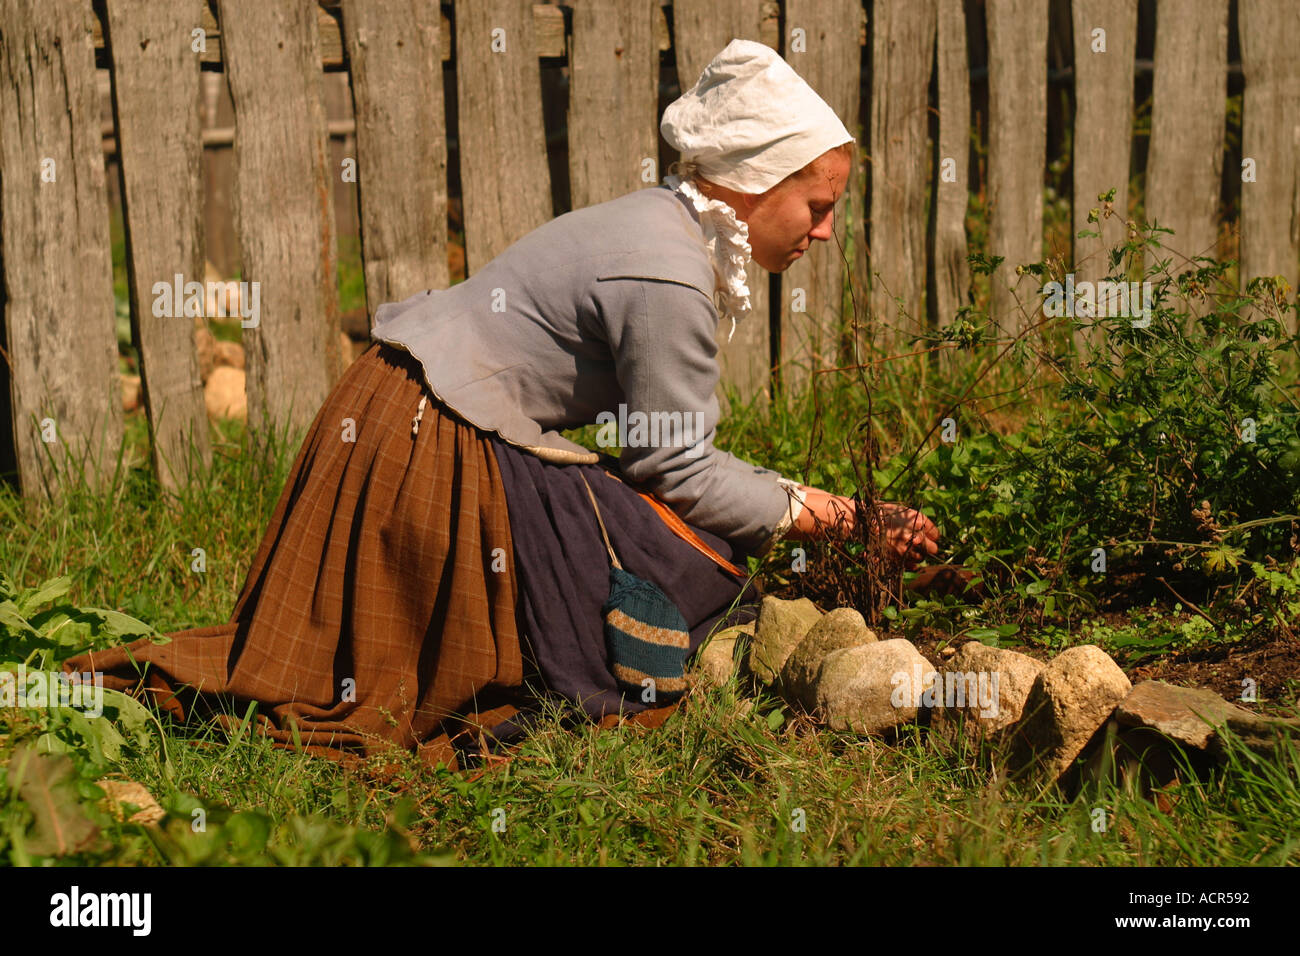 Woman Tending Garden Plimouth Plantation Pilgrim Settlement Plymouth ...